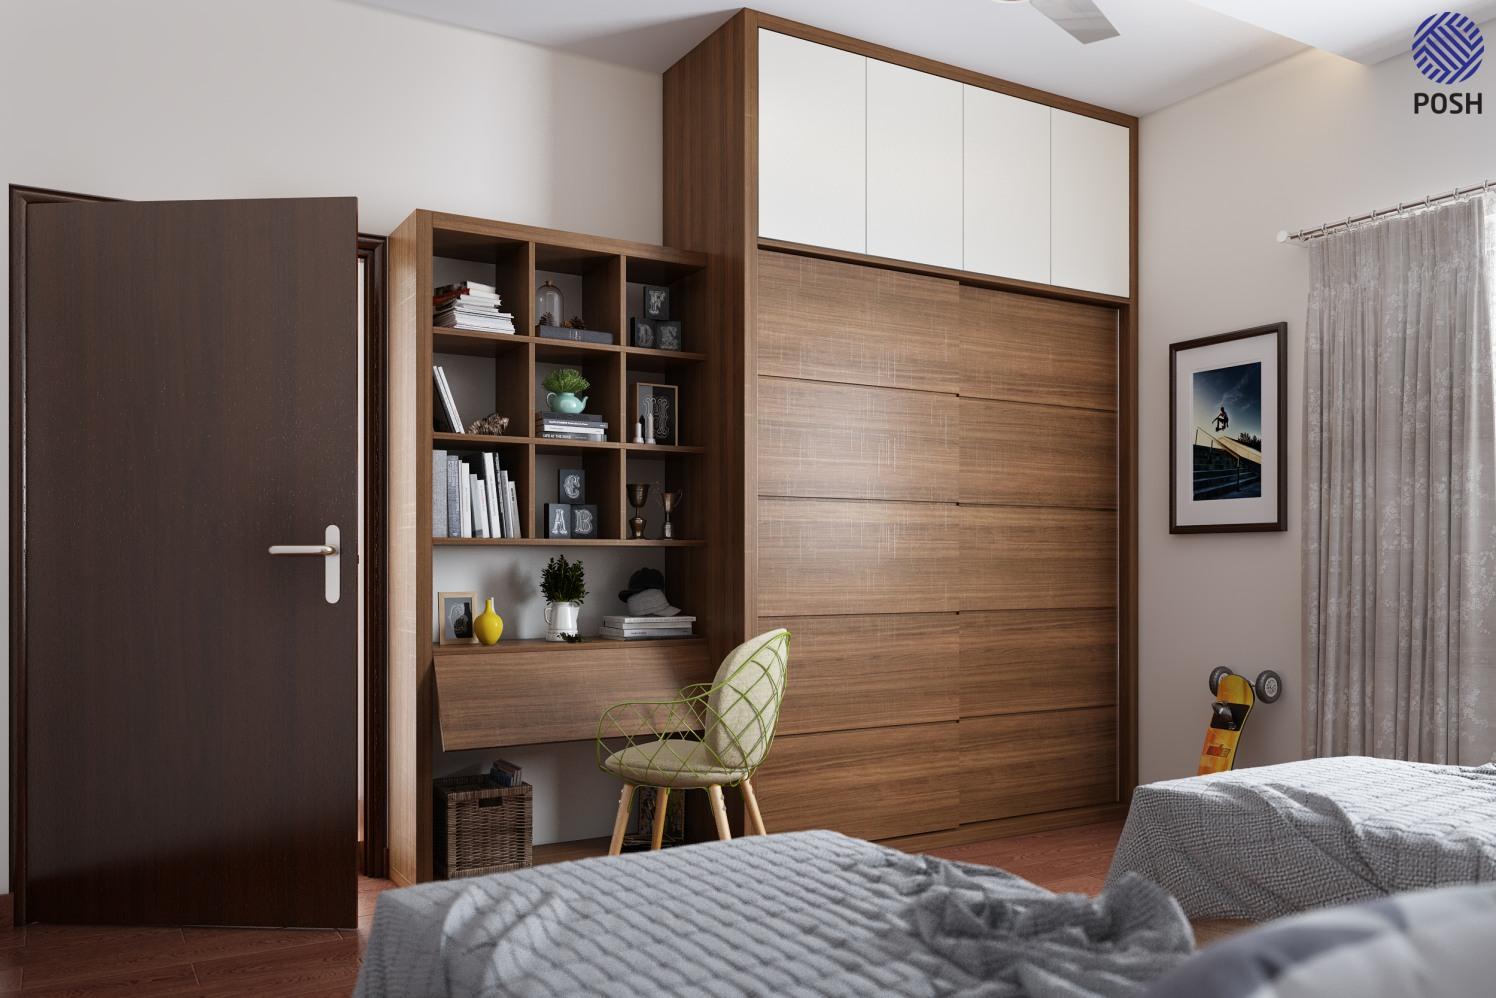 Contemporary kids bedroom with wooden furniture by Priyanka Rai Bedroom Contemporary | Interior Design Photos & Ideas